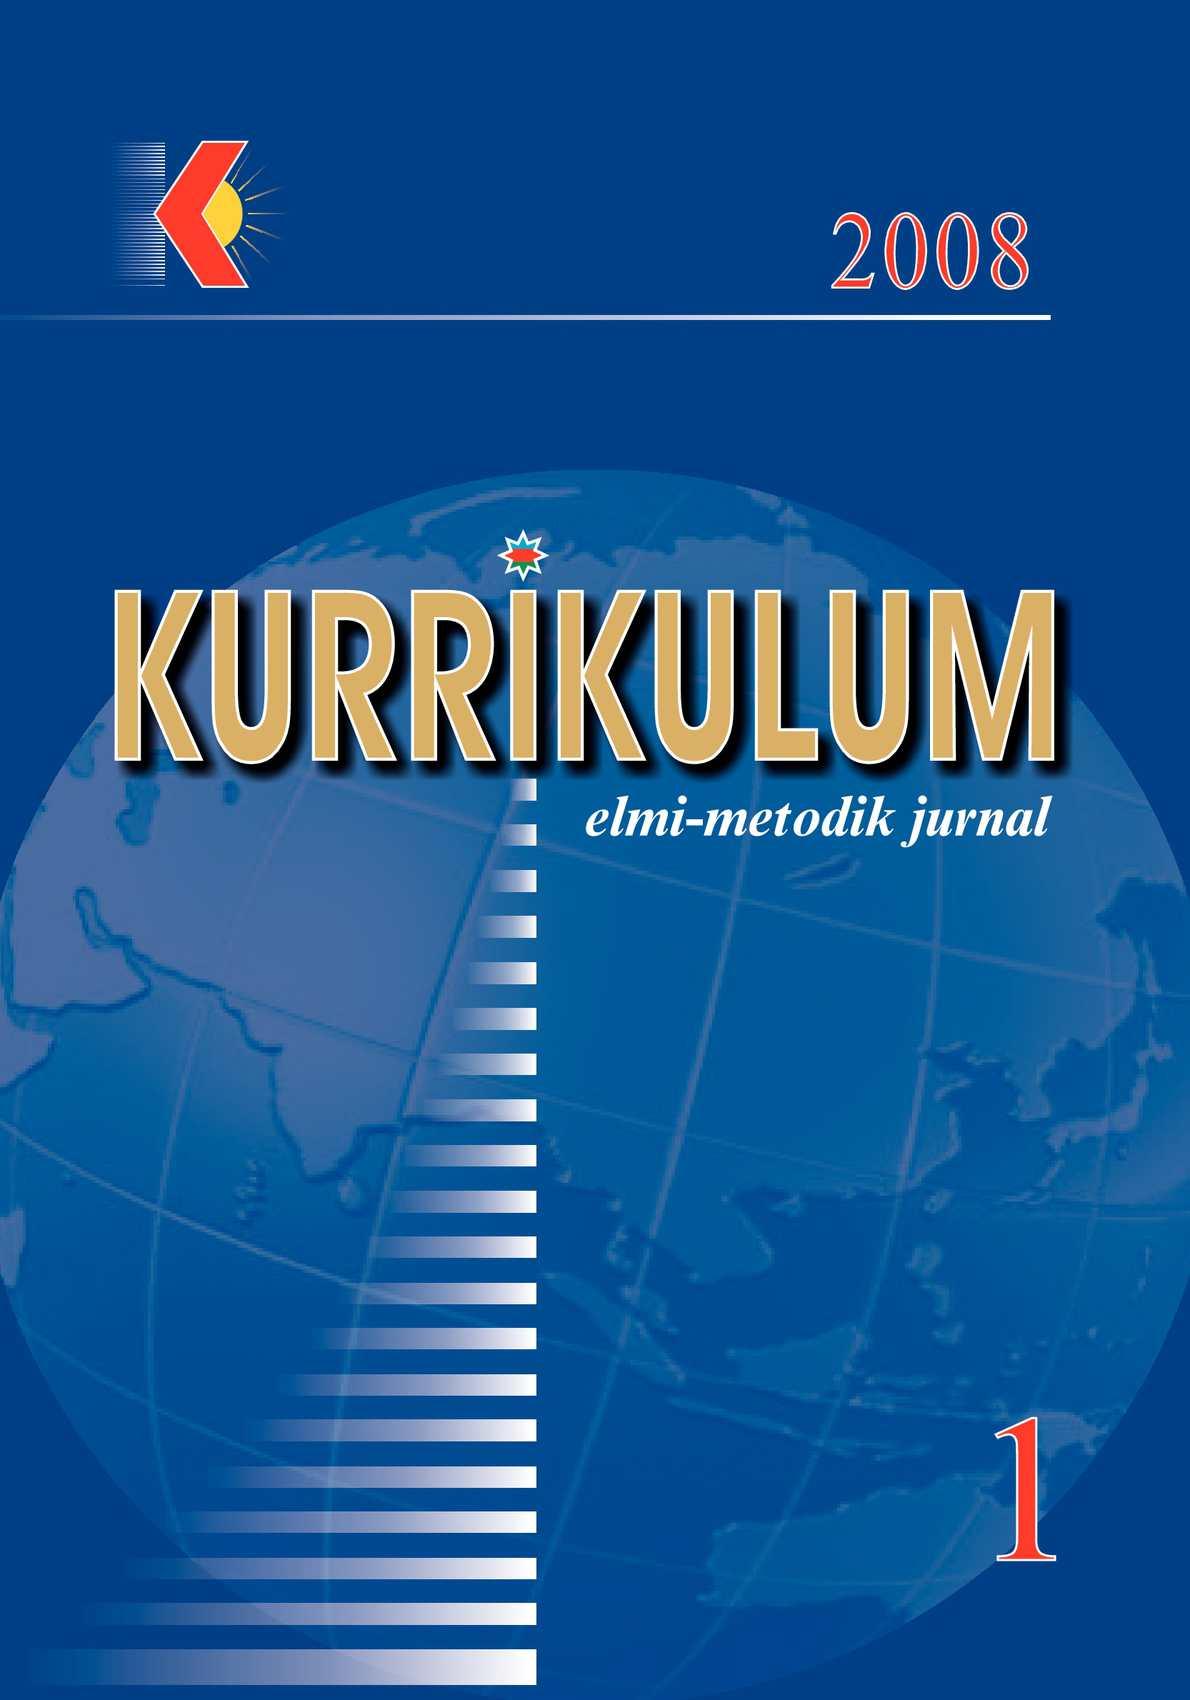 Kurikulum Jurnalı 2008, 1-ci nömrə